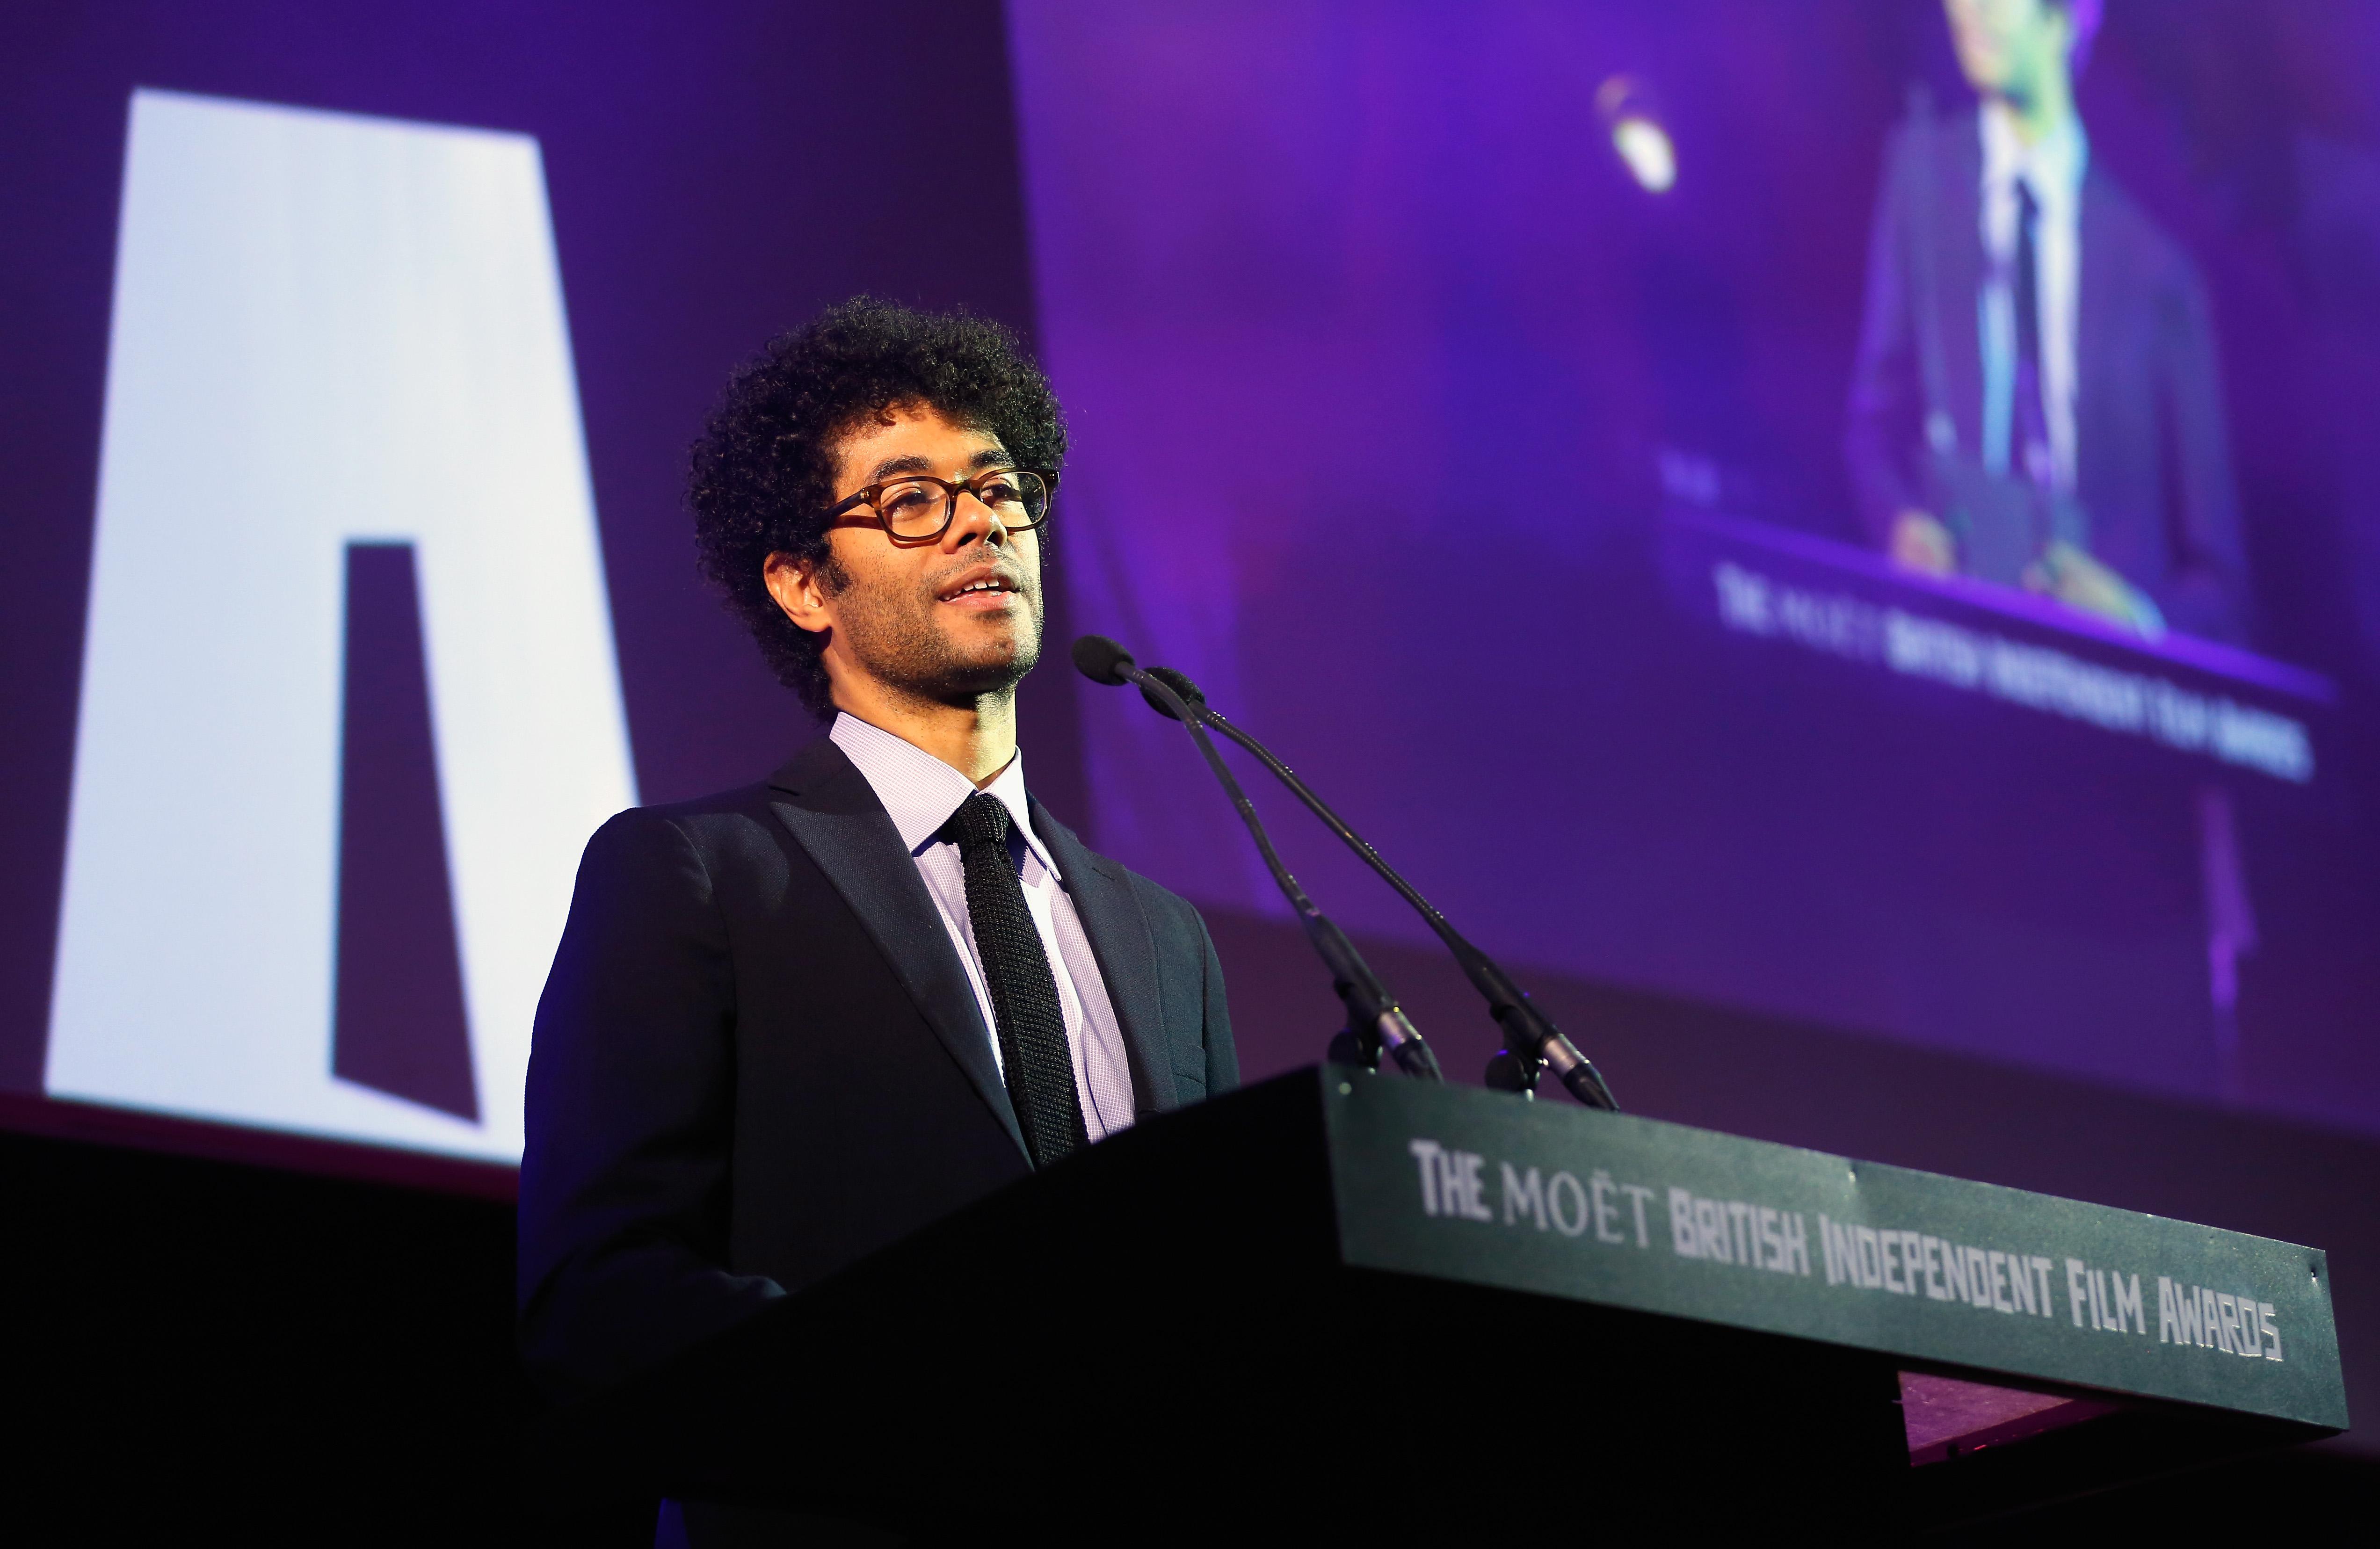 The Moet British Independent Film Awards 2015 - Awards